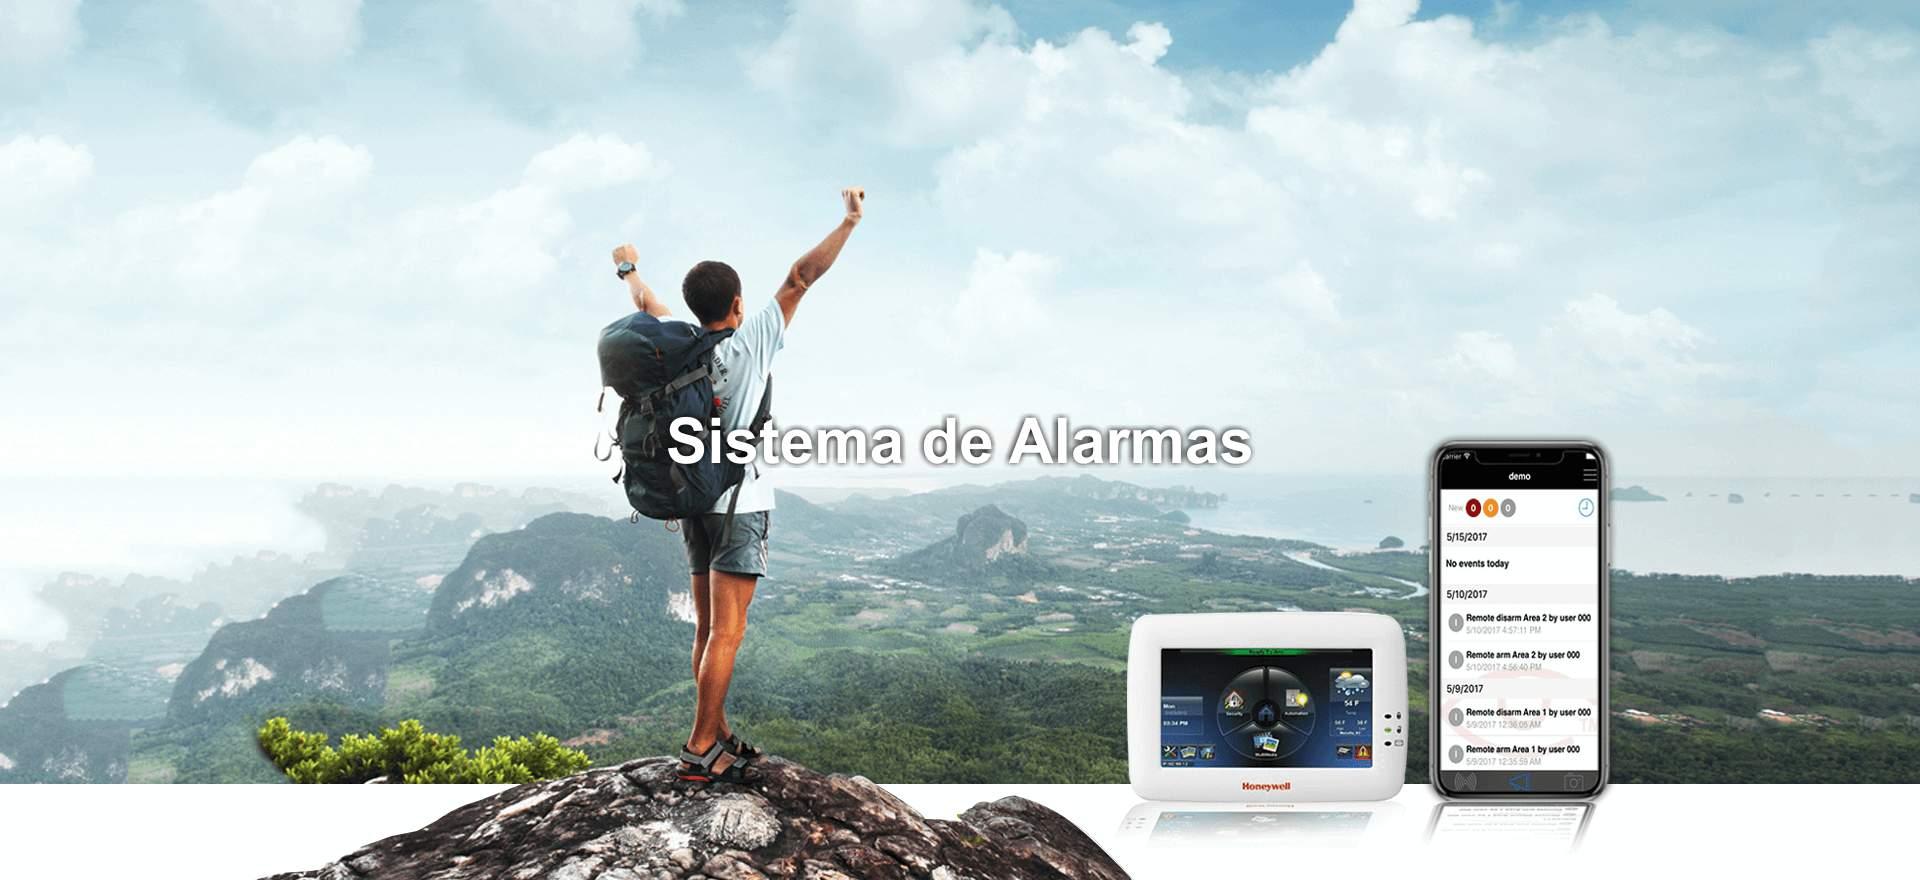 Alarmas para casa o negocio, controle desde su celular. Venta e Instalación de Alarmas de Seguridad en Lázaro Cárdenas, Michoacán e Ixtapa Zihuatanejo, Guerrero